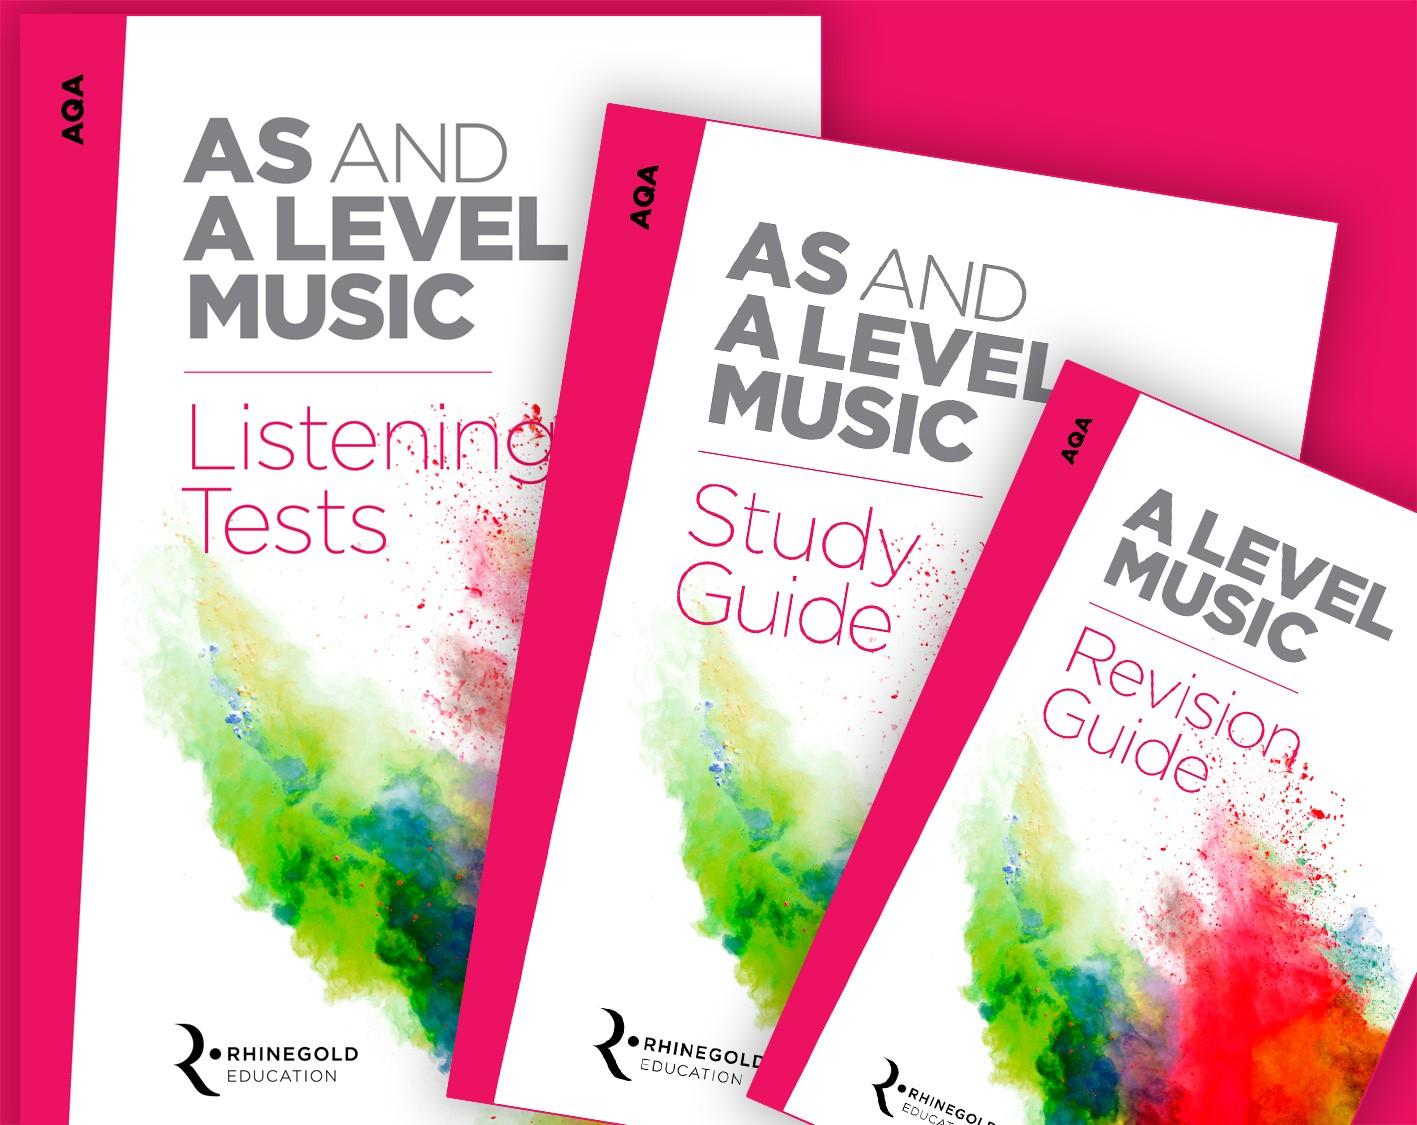 Rhinegold Education: AQA A Level Music Exam Pack